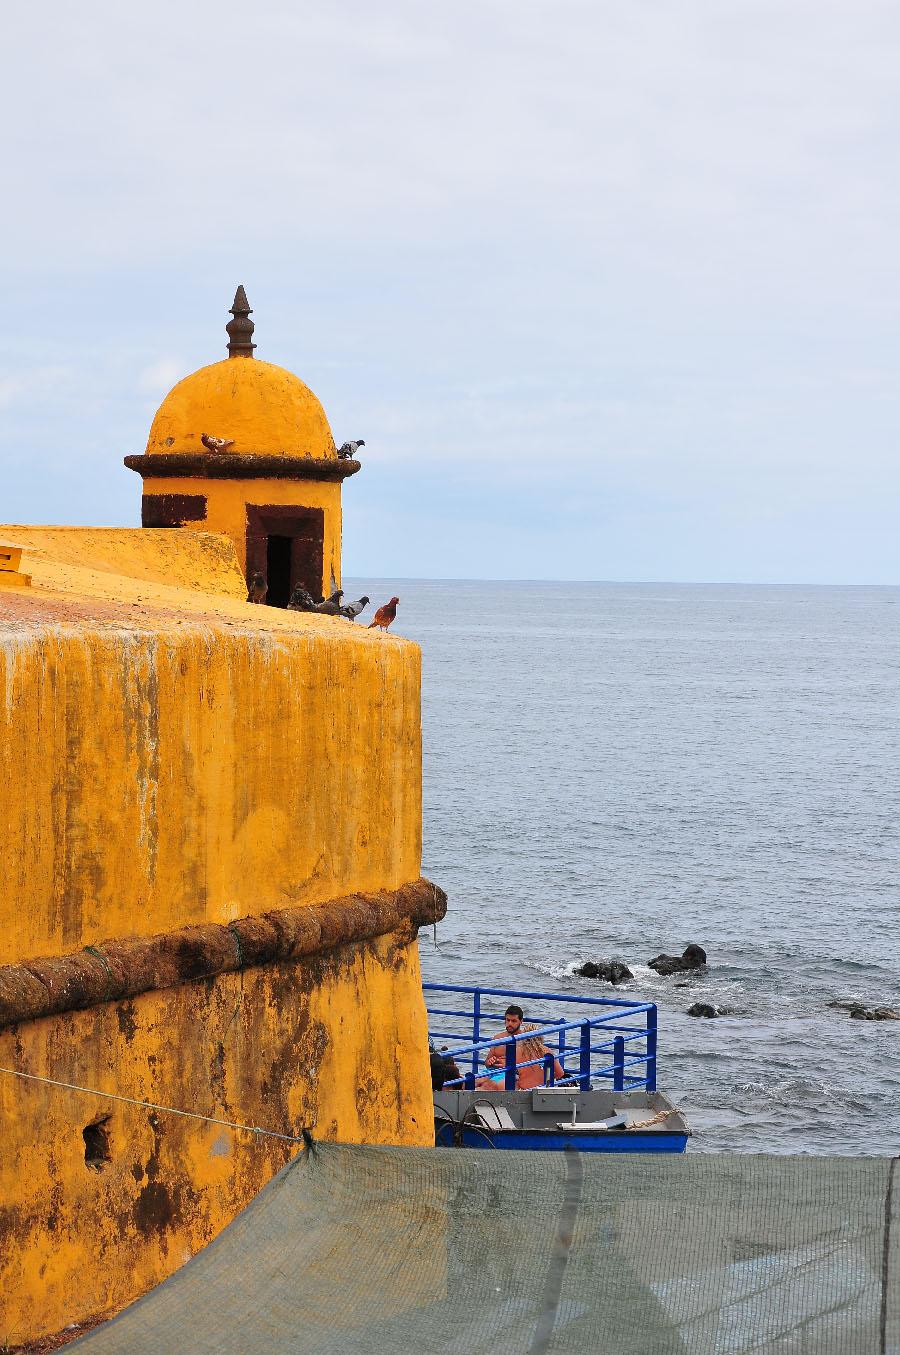 forteresse santiago ou Sao Tiago, Funchal